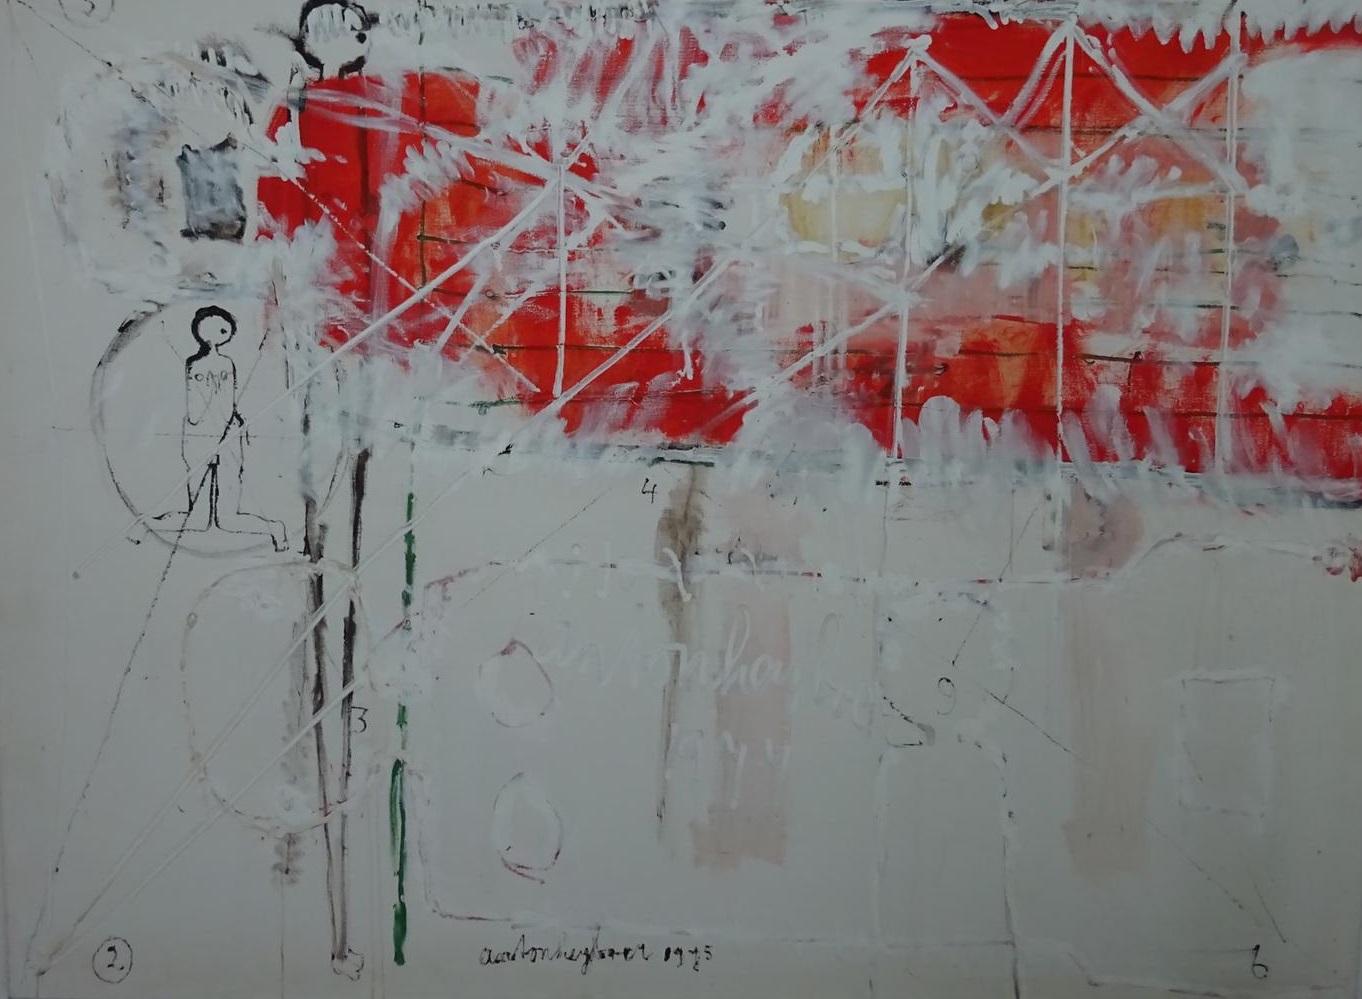 Kneeling abstract figure